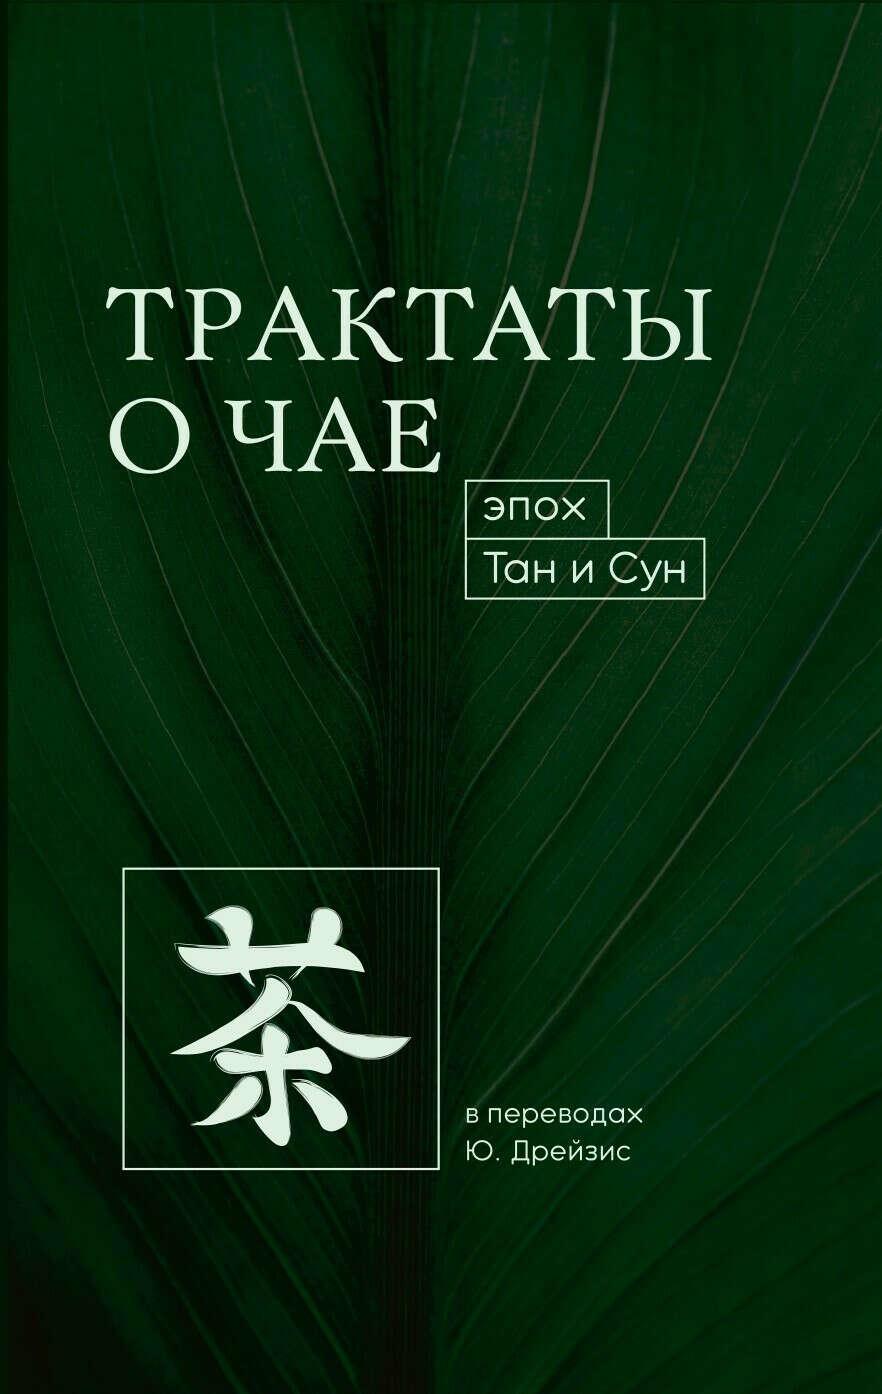 Книга Трактаты о чае эпох Тан и Сун